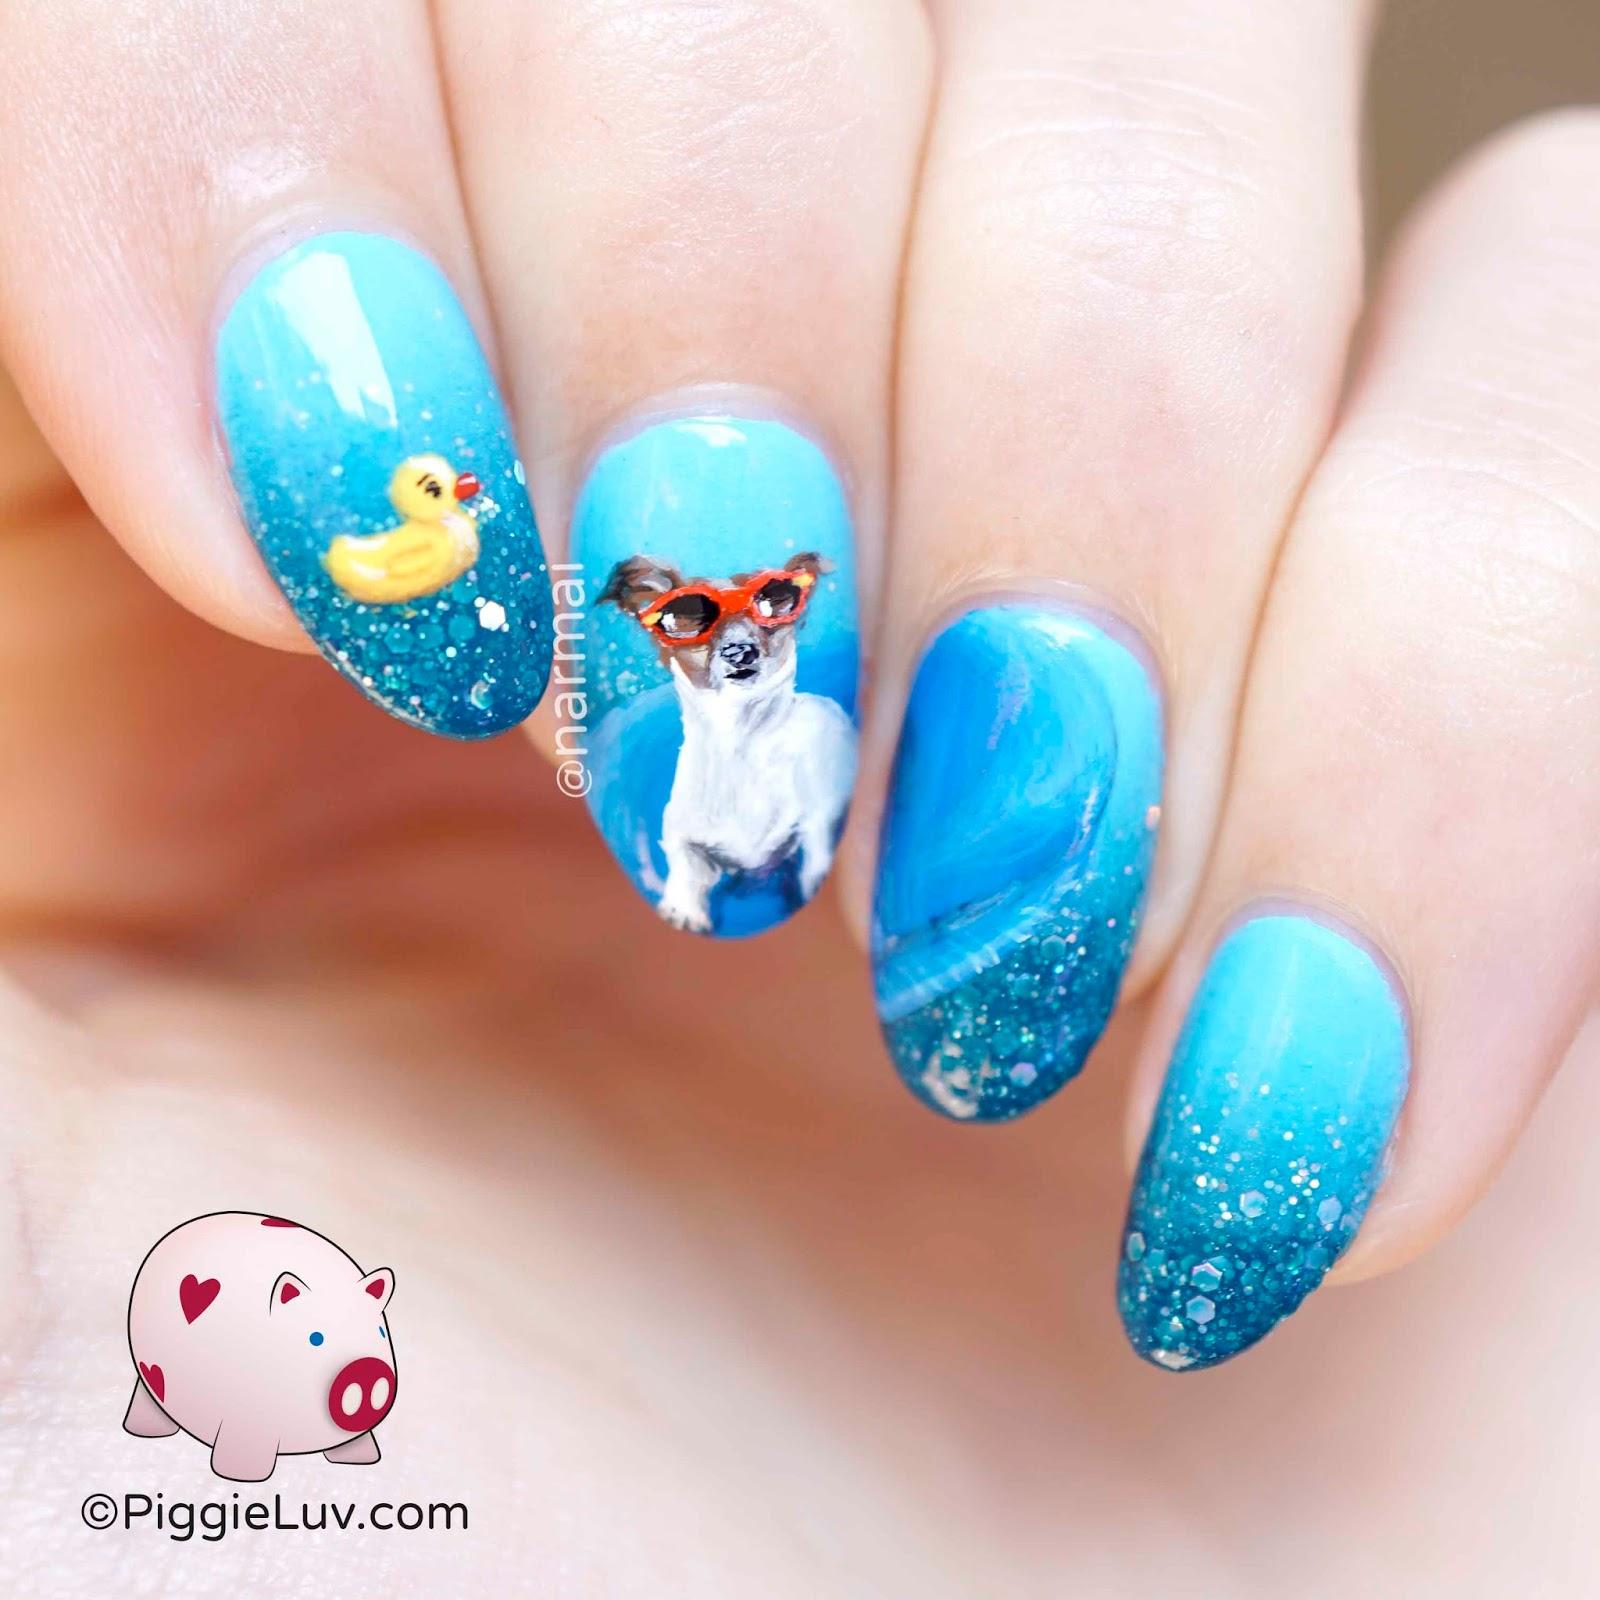 Piggieluv swimming dog nail art swimming dog nail art prinsesfo Image collections